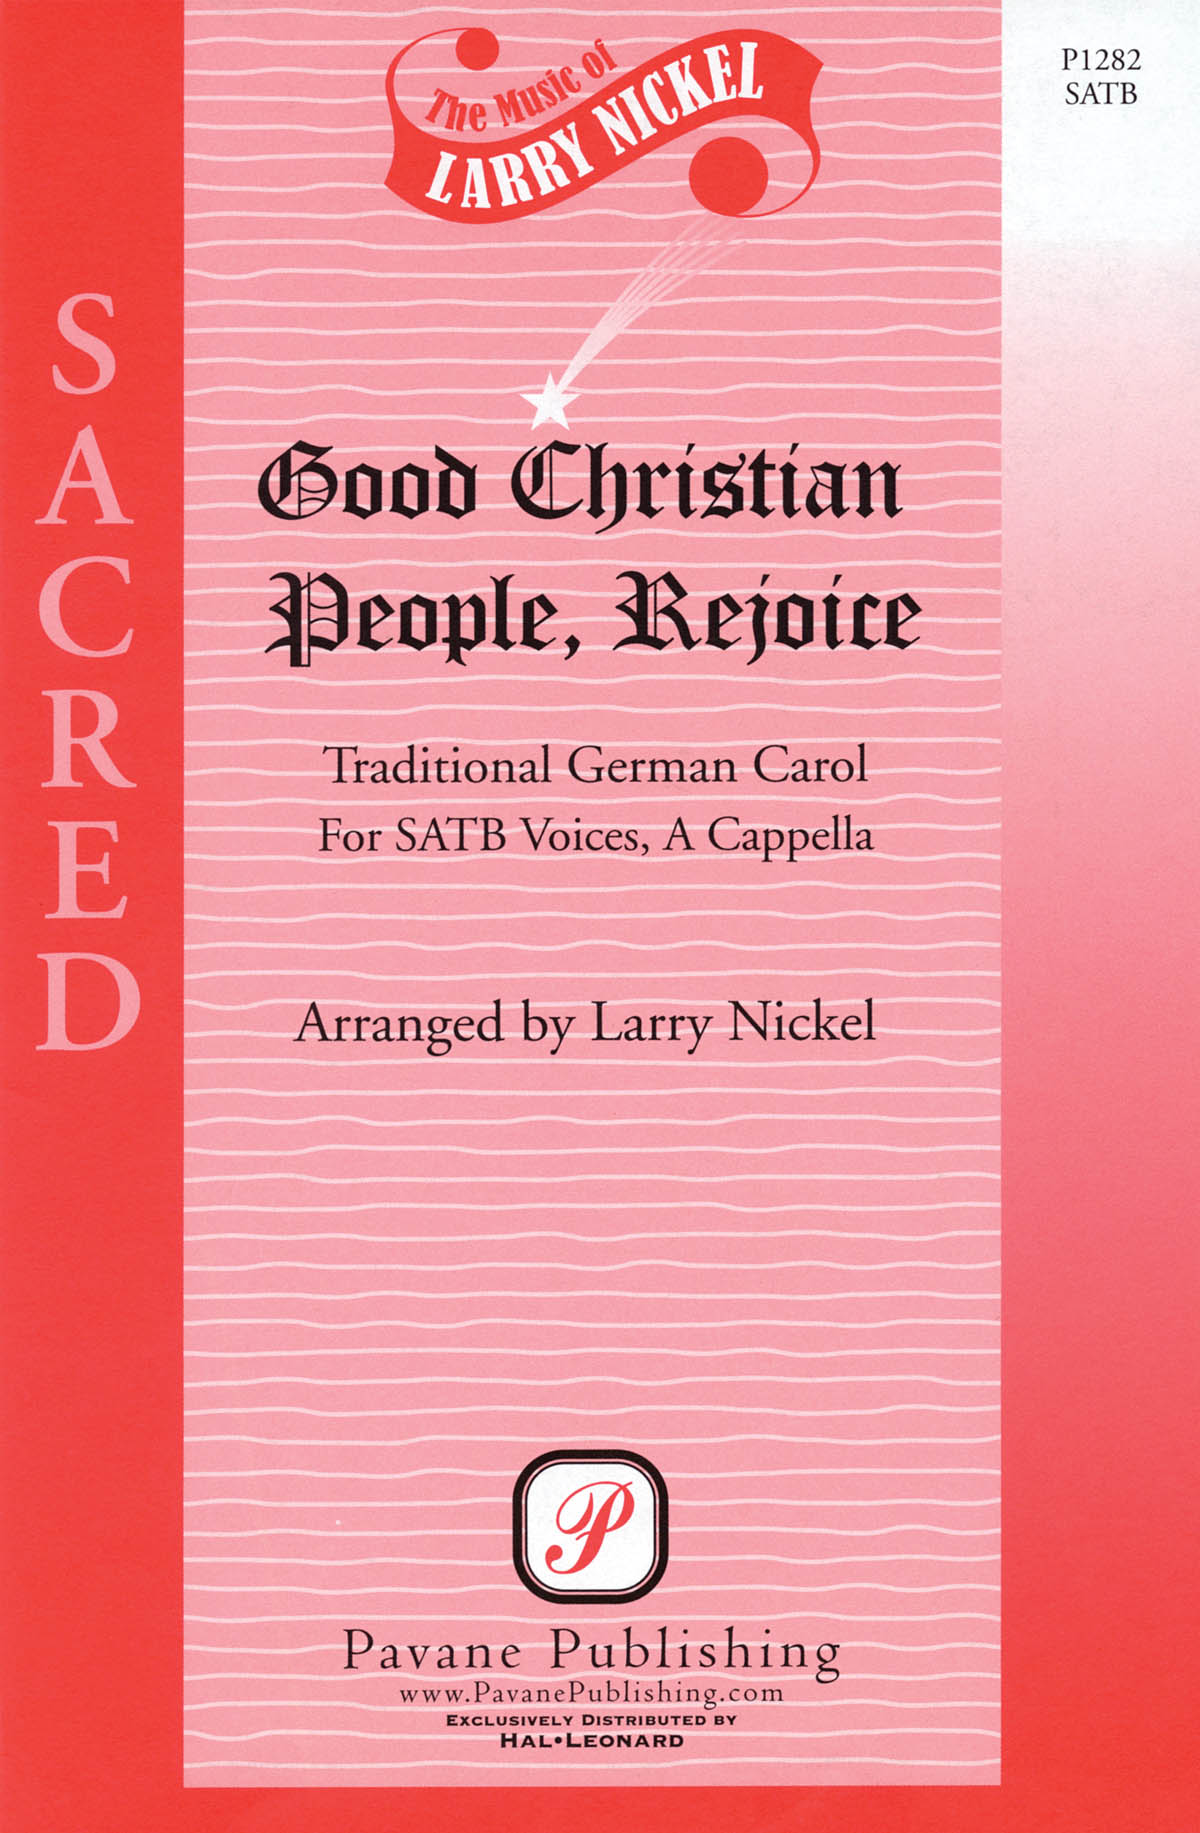 Good Christian People  Rejoice: Mixed Choir a Cappella: Vocal Score